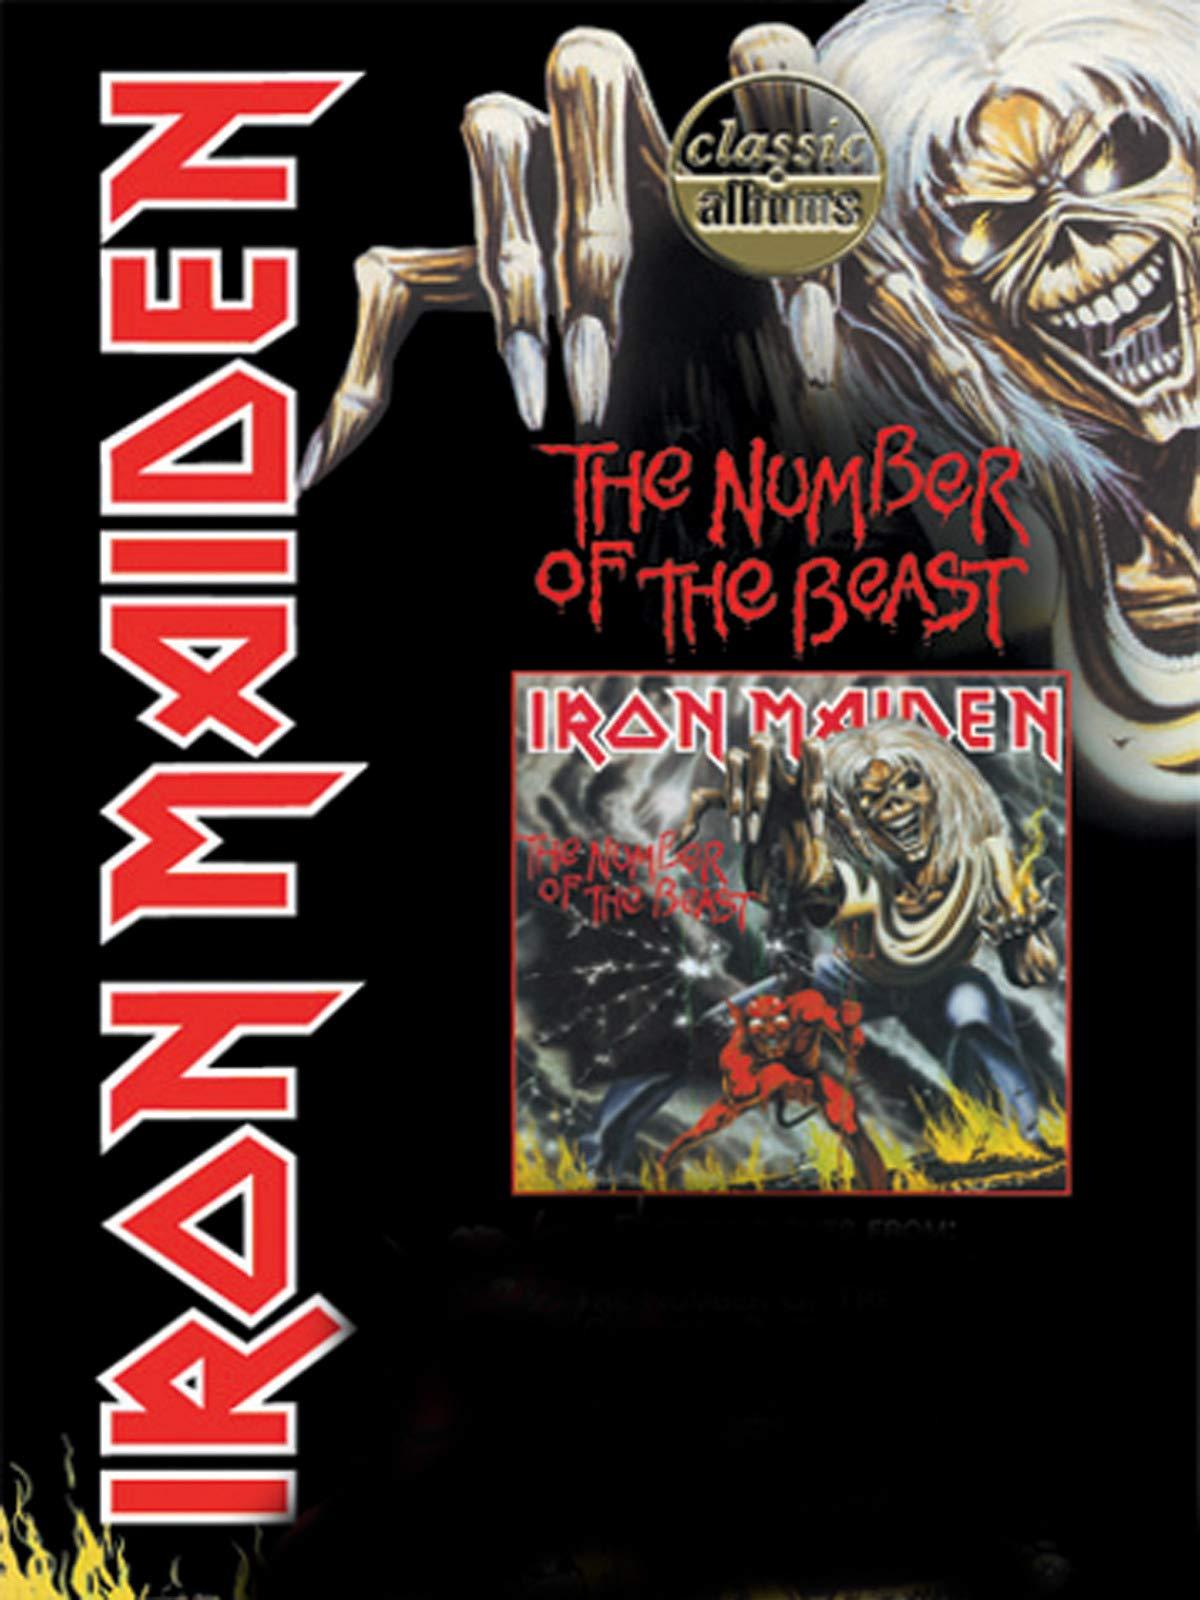 Iron Maiden - Number Of The Beast (Classic Album) on Amazon Prime Instant Video UK